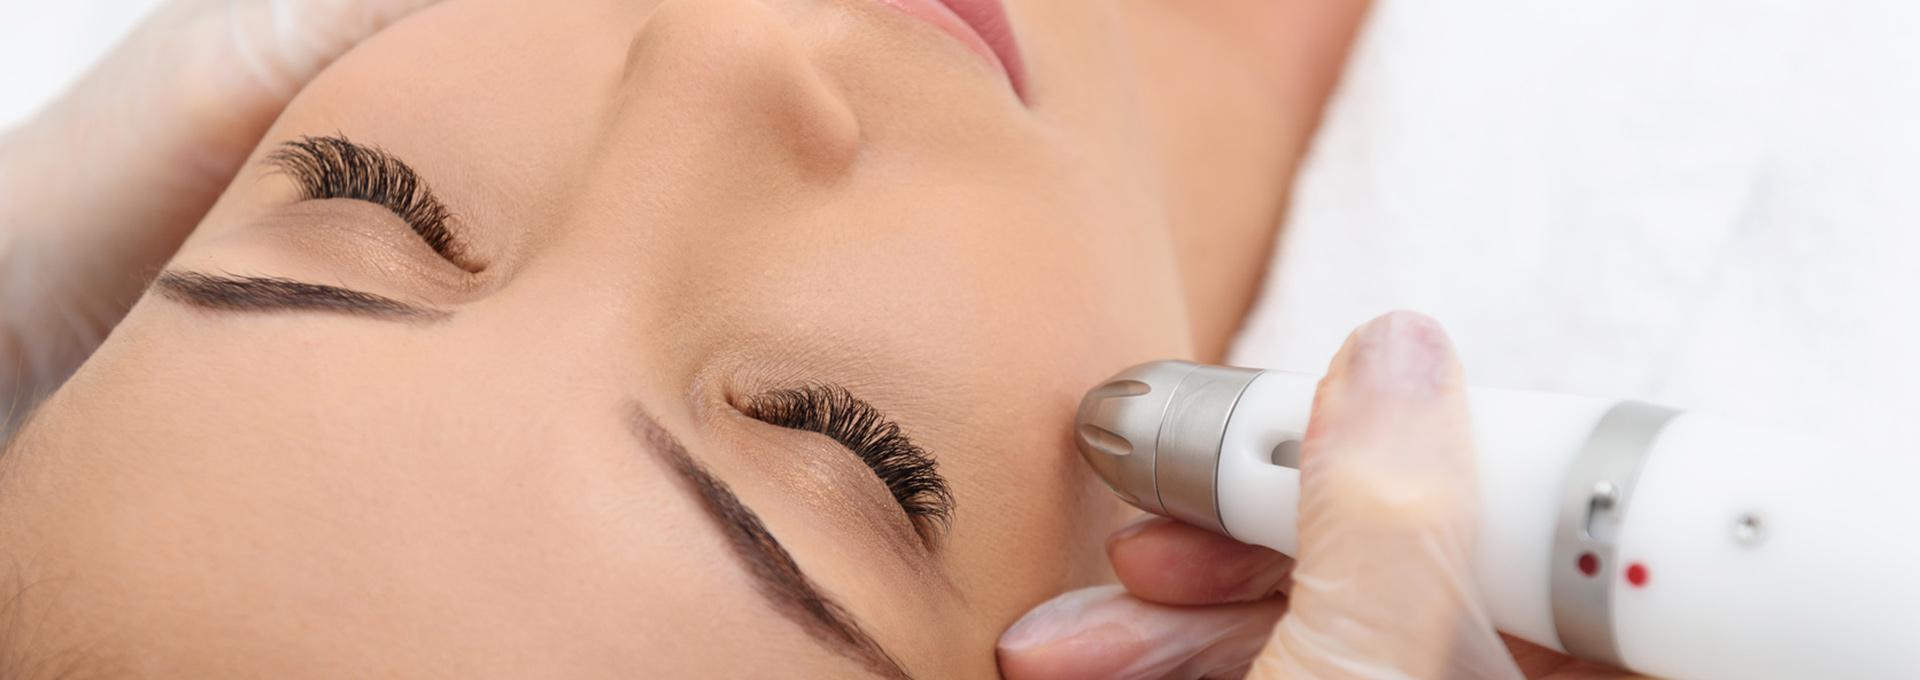 Kosmetik-Stolberg-Hameln-Gutschein-Medical-Beauty